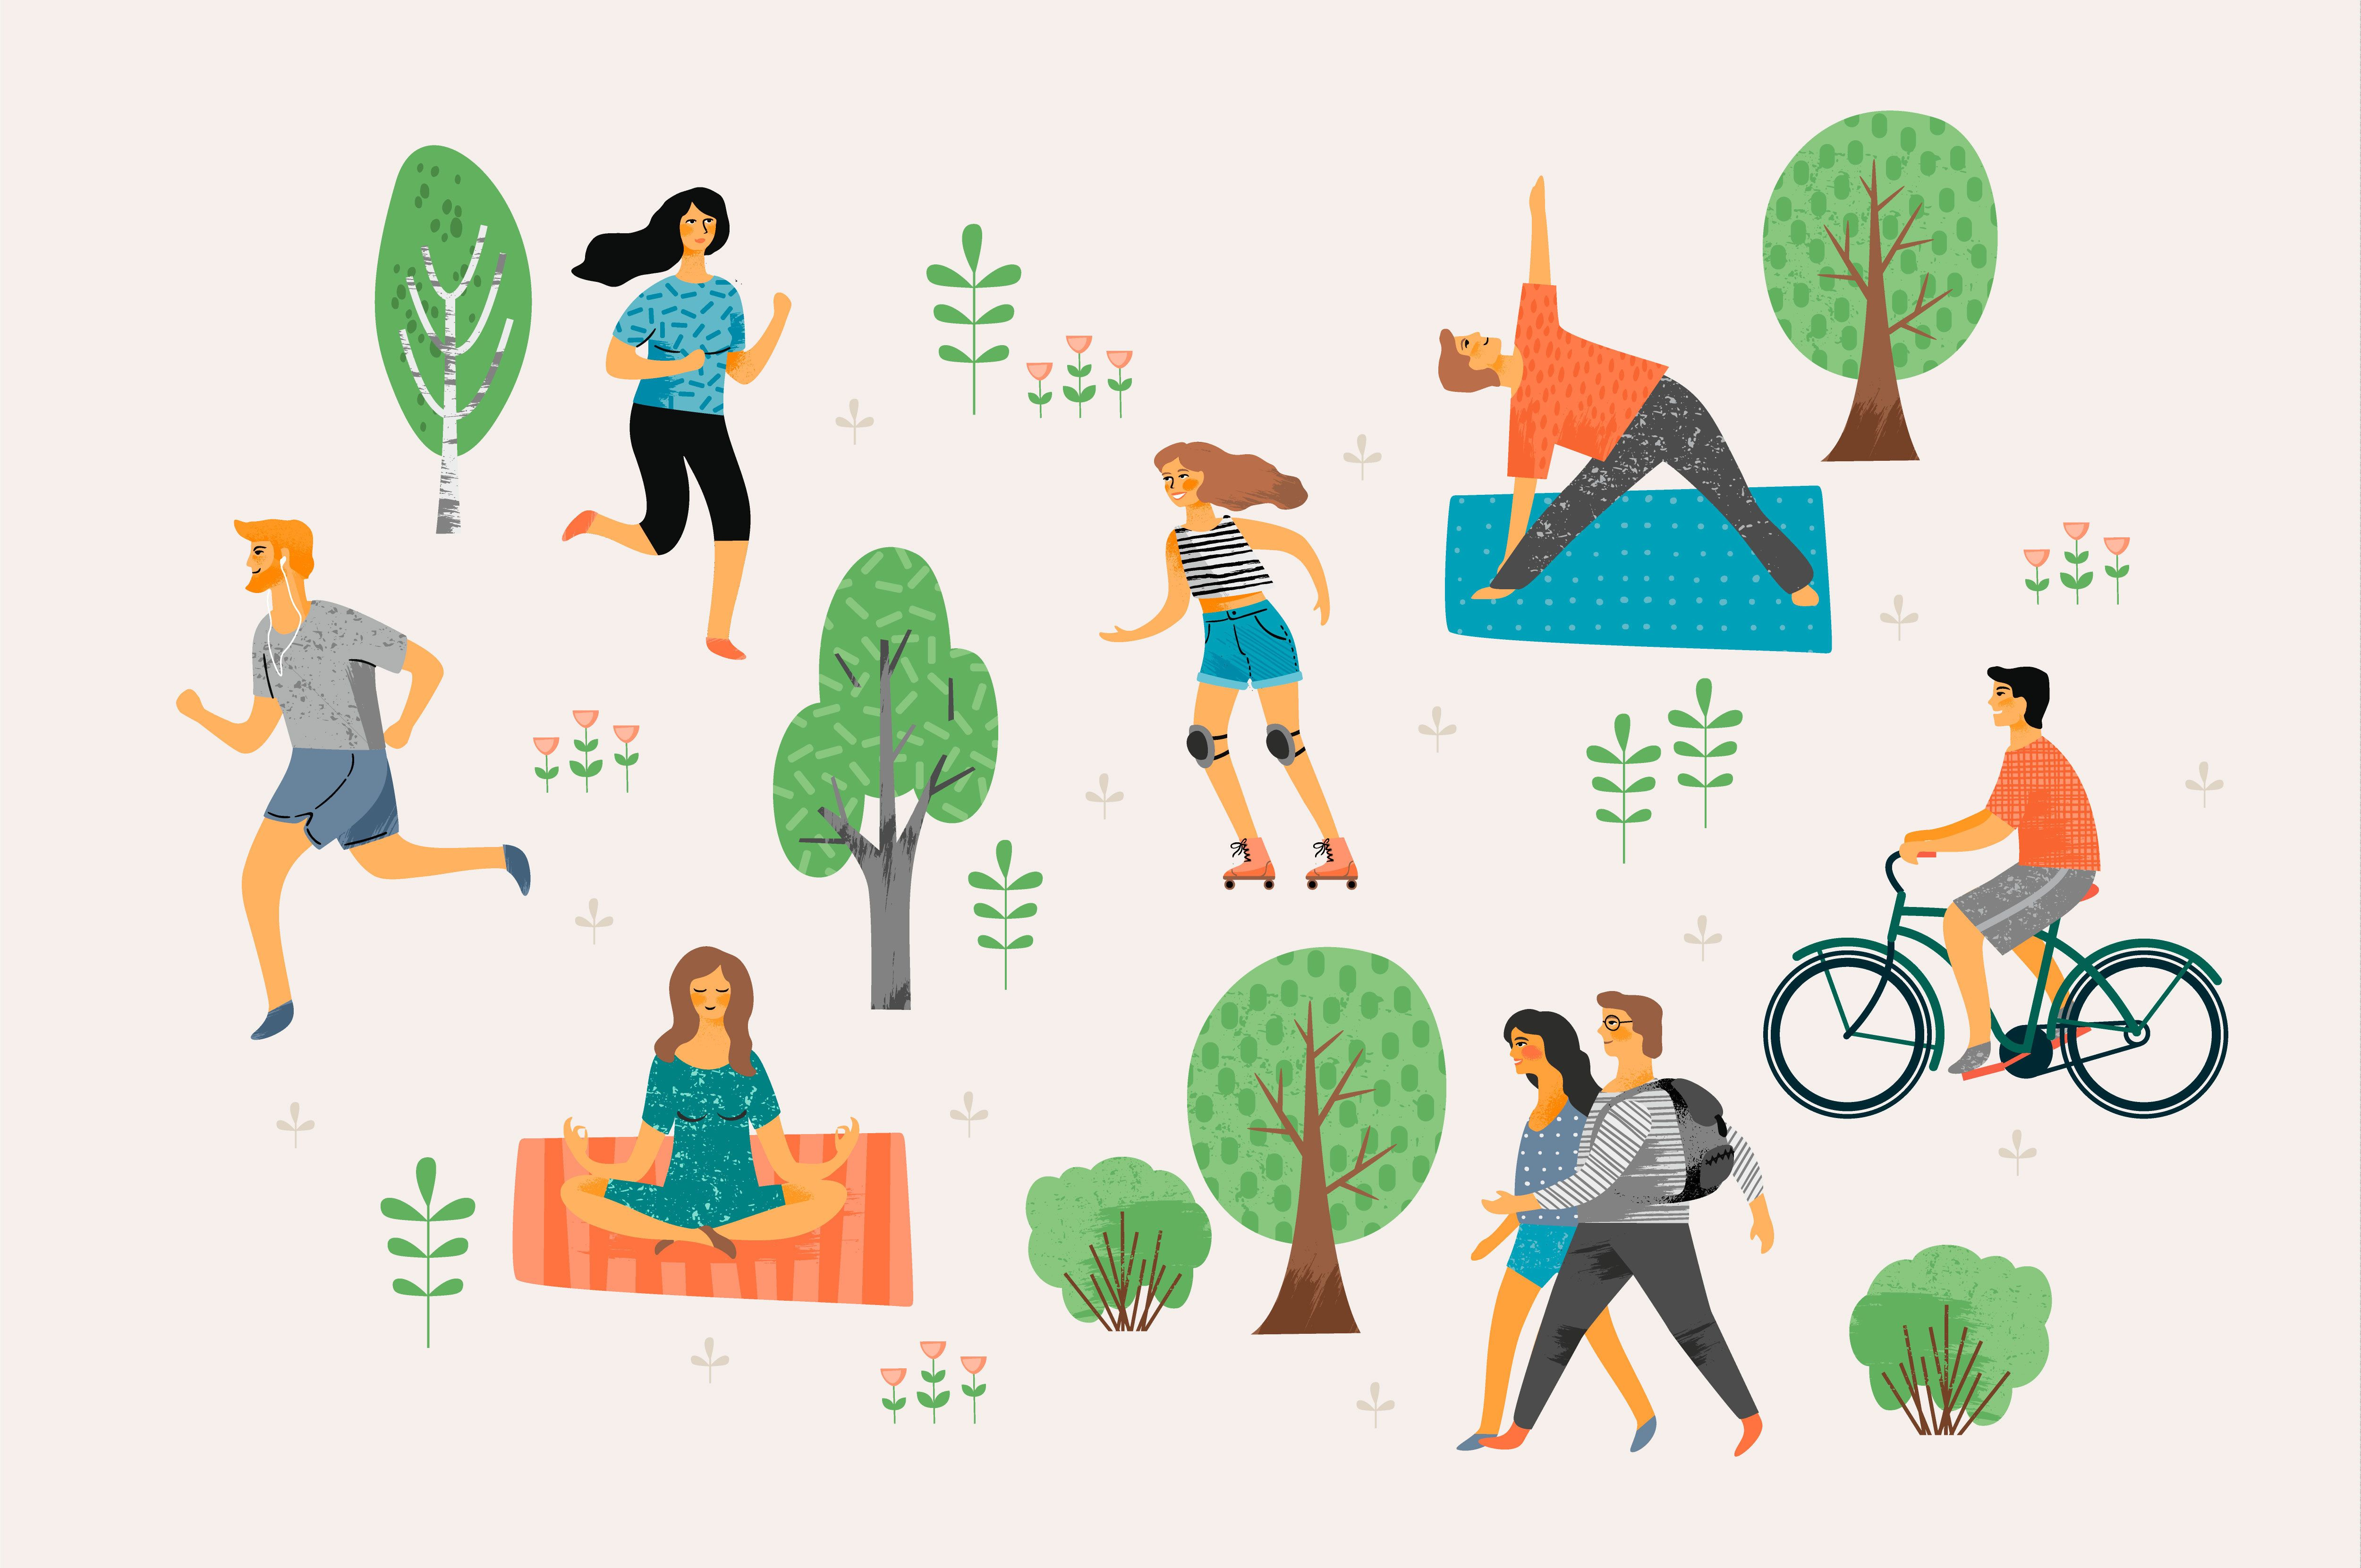 Fitness Inspiration from Nature Illustration, Design